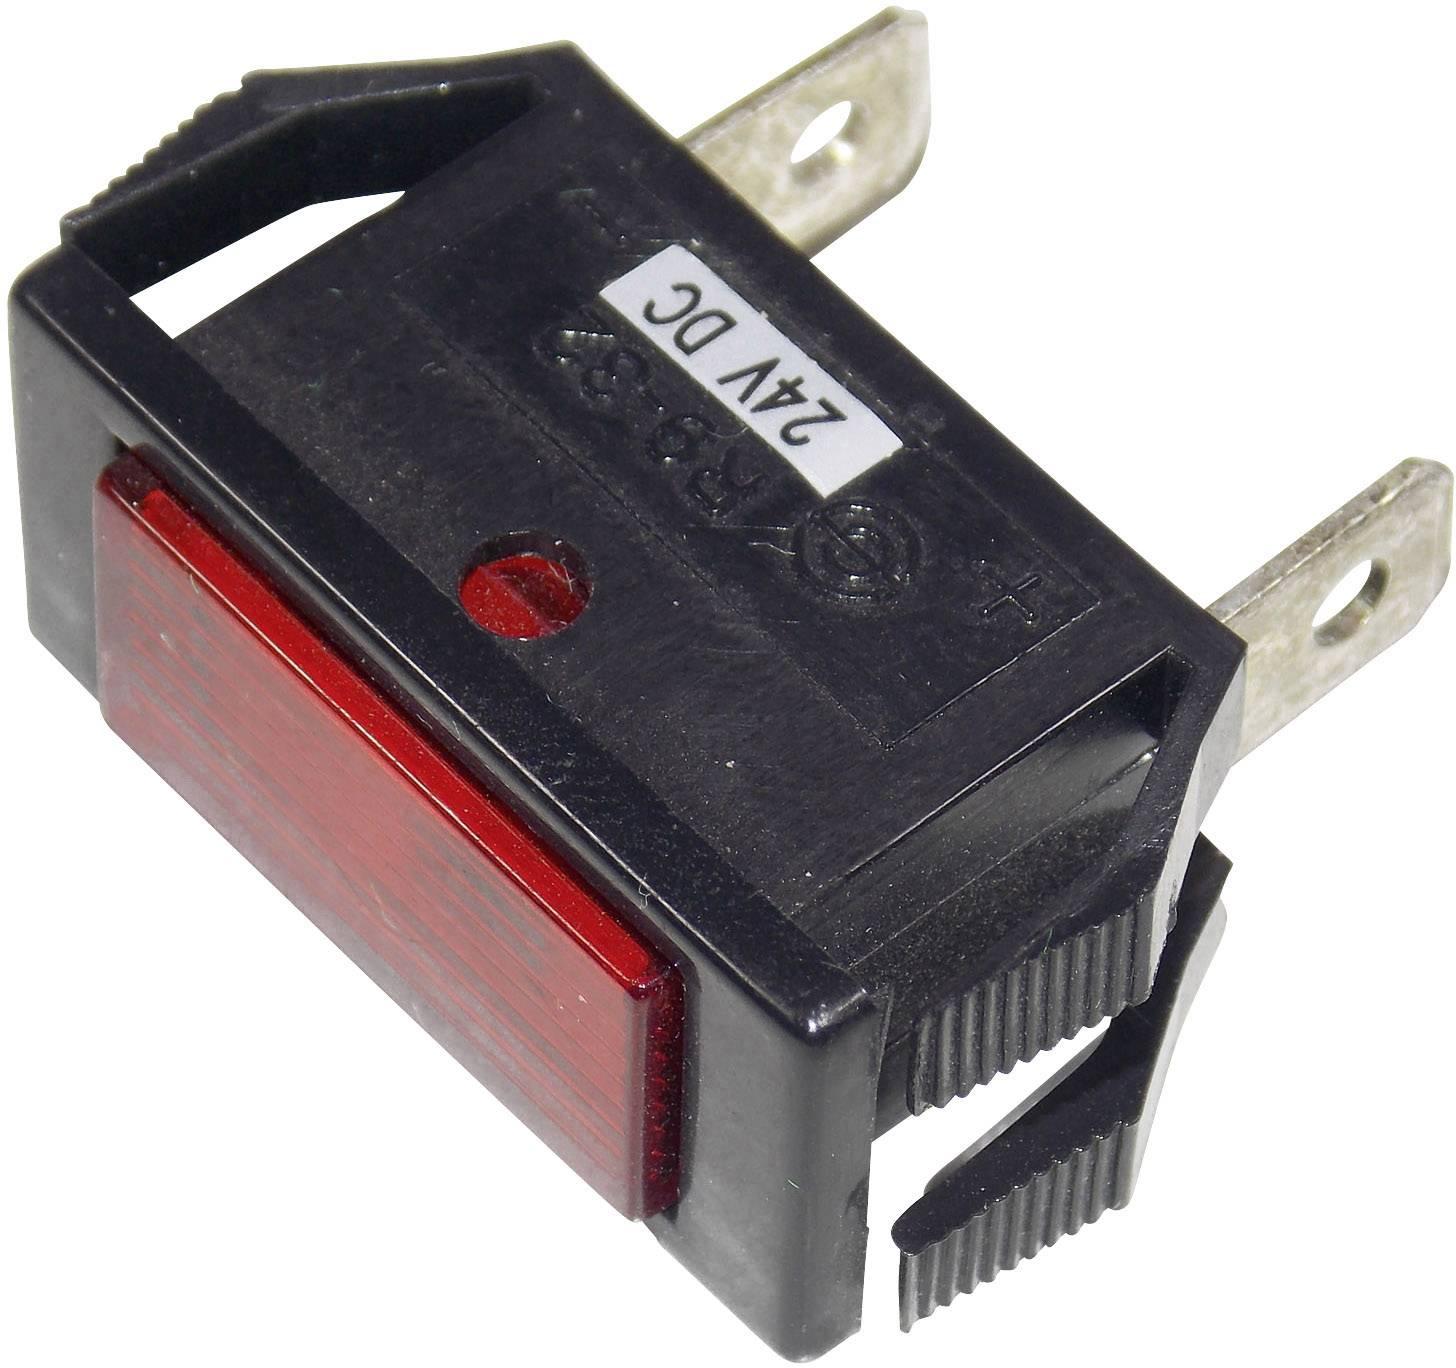 SCI R9-32B 28430c984, červená, 1 ks